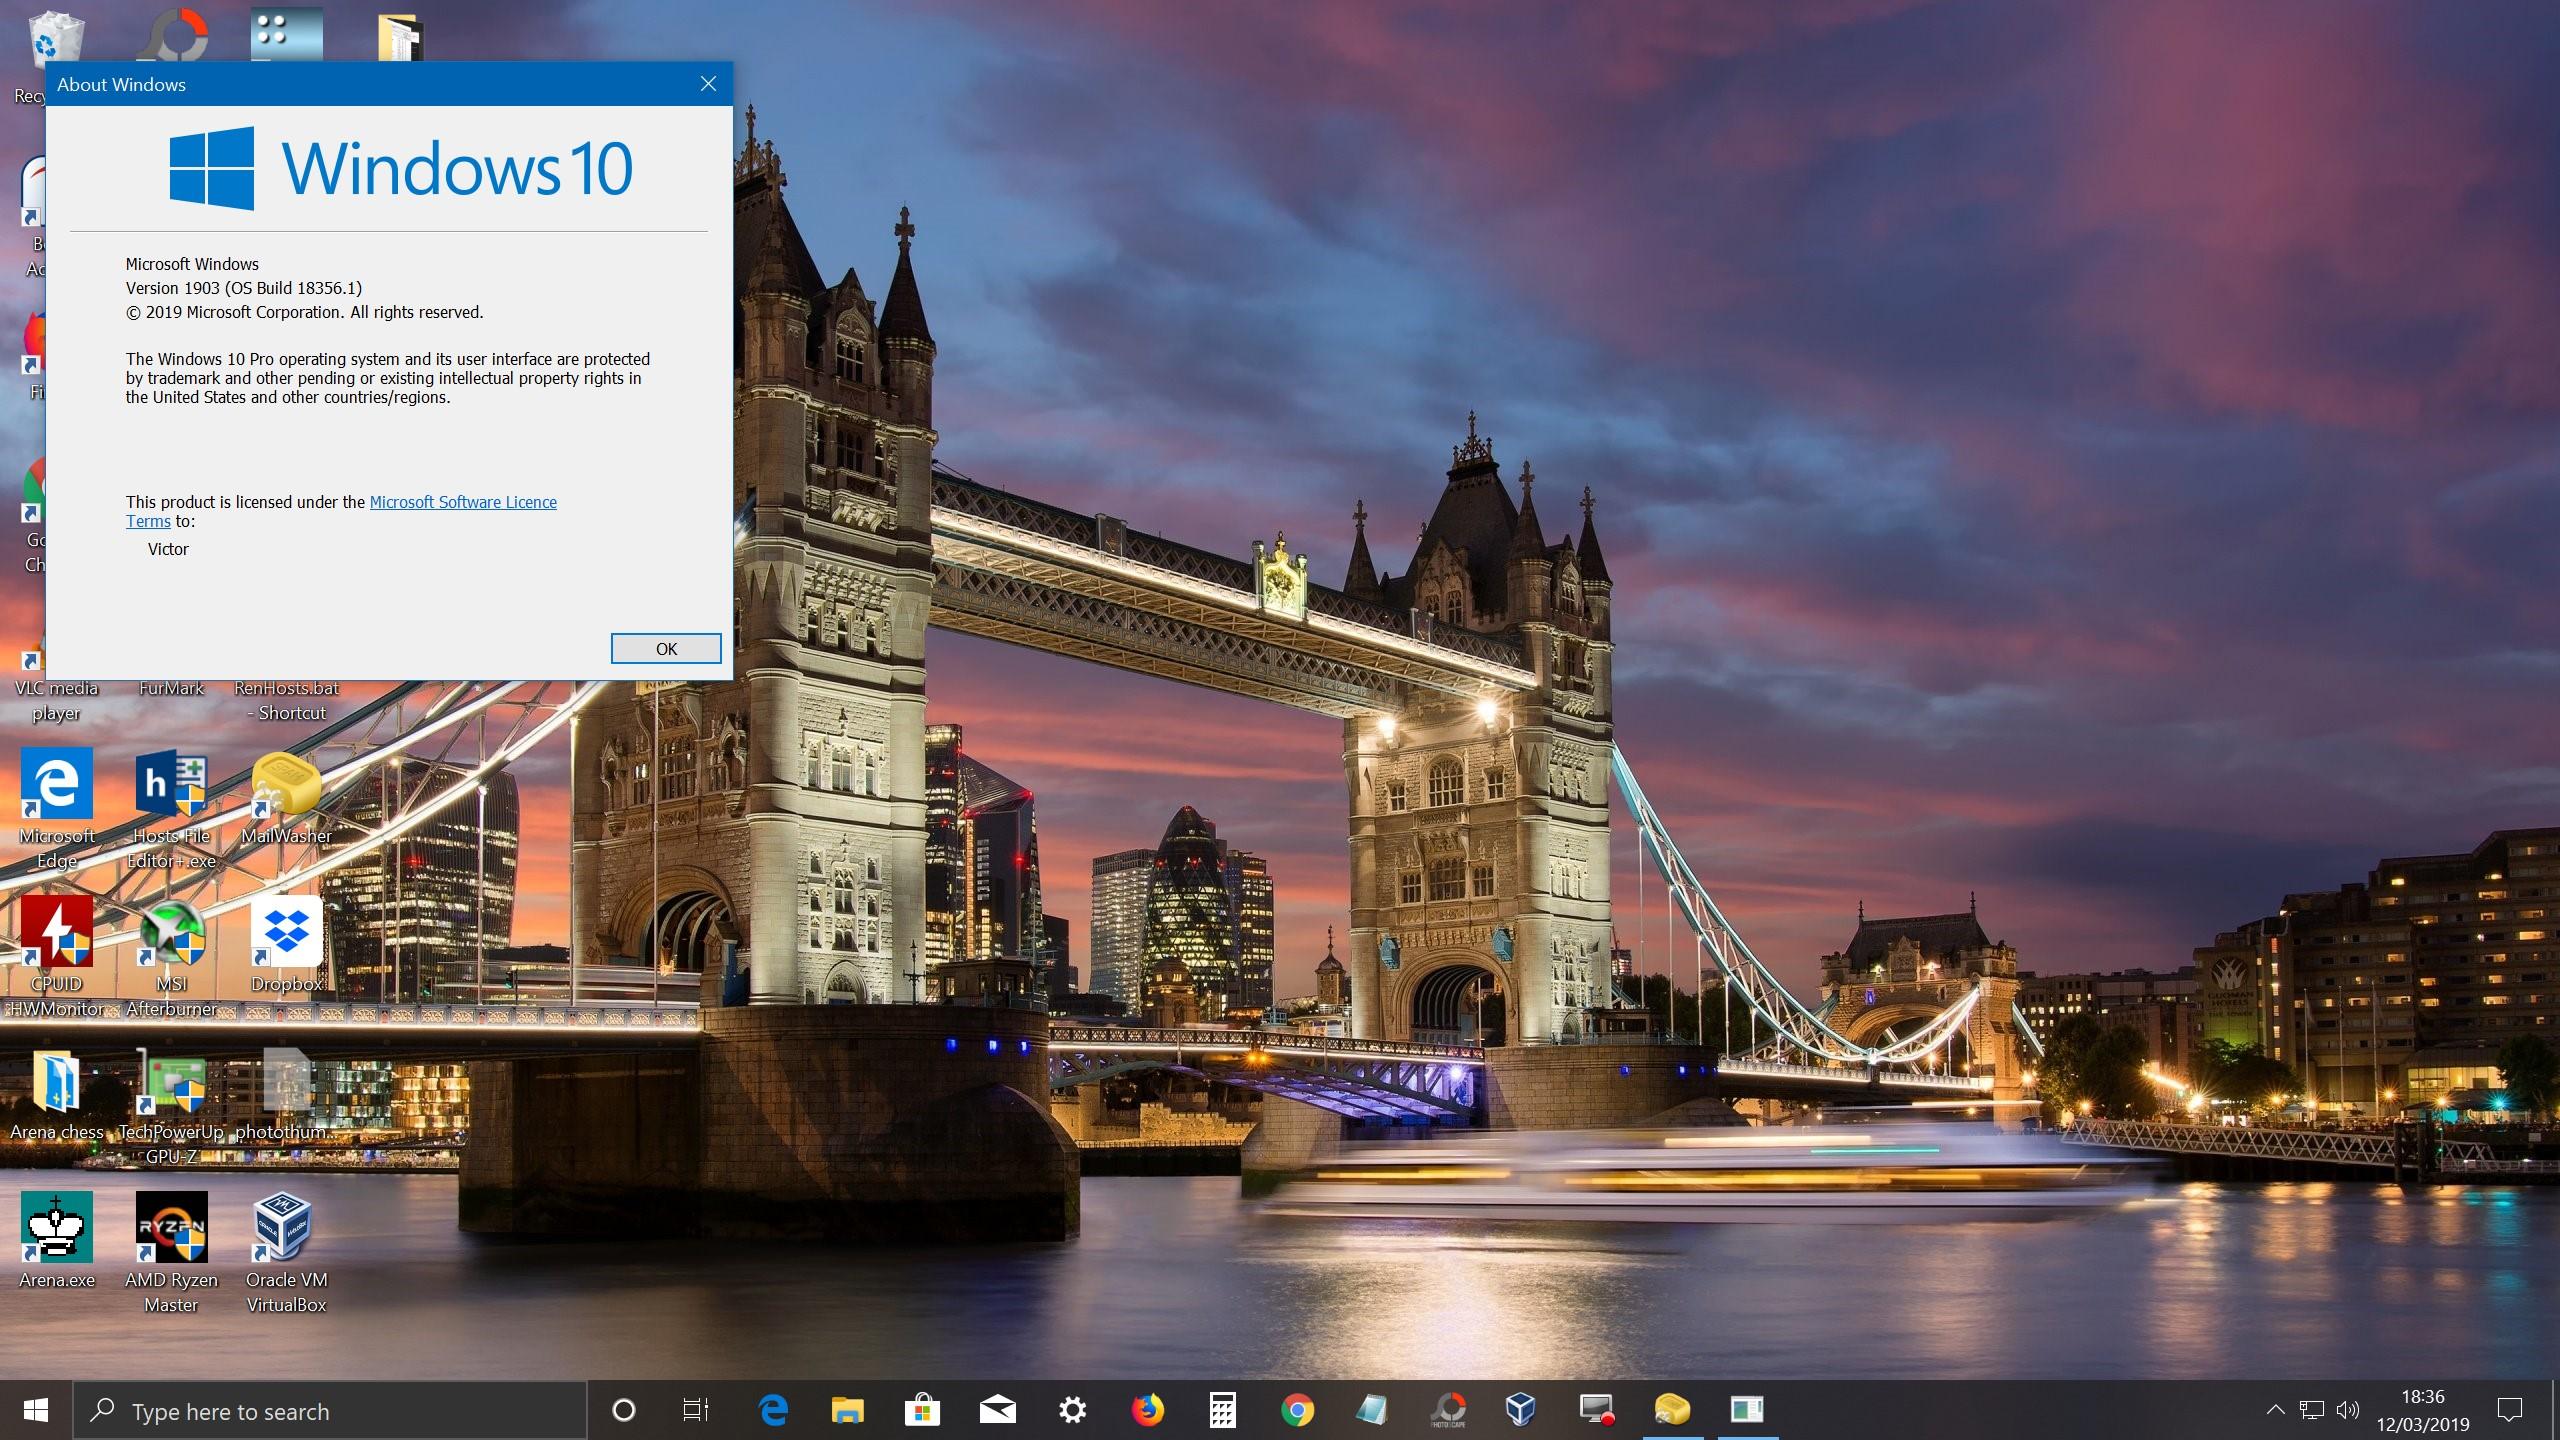 I downloaded Windows 10 vers 1803 - Page 2 - Virgin Media Community